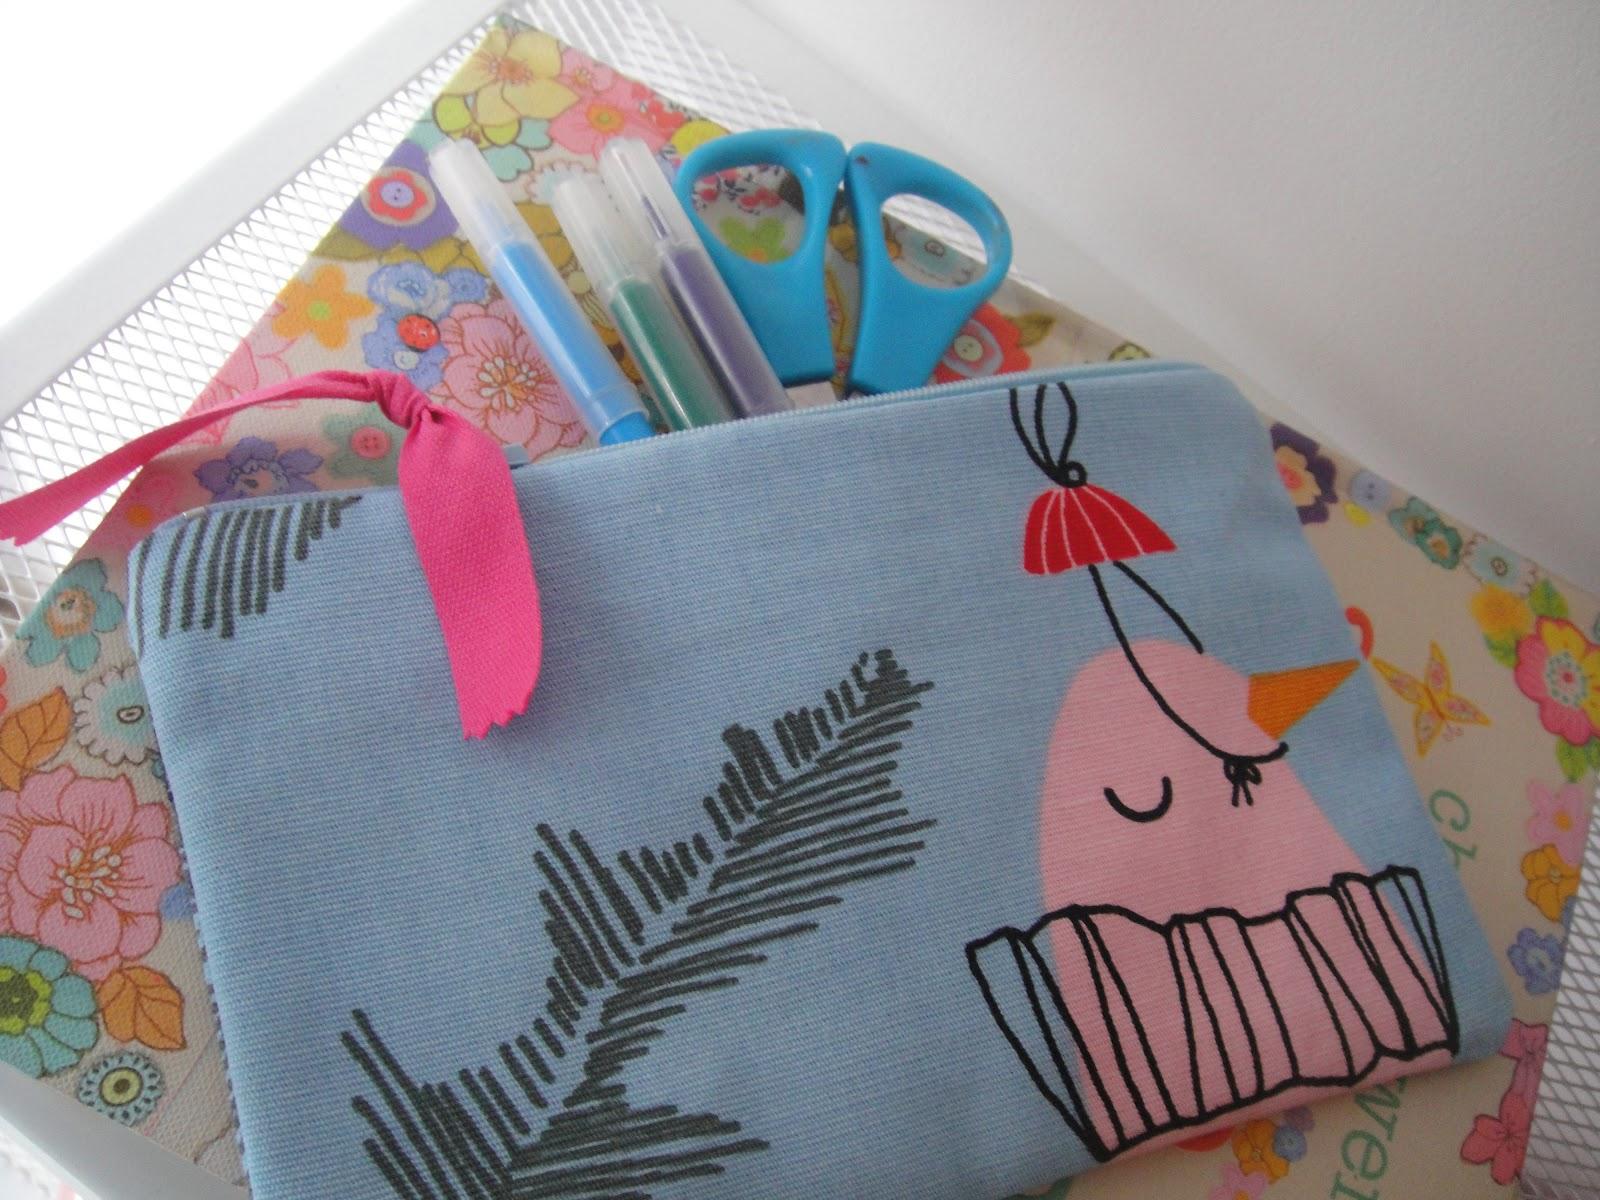 My sock friends co astucci e pochette in tessuto ikea - Portapenne ikea ...